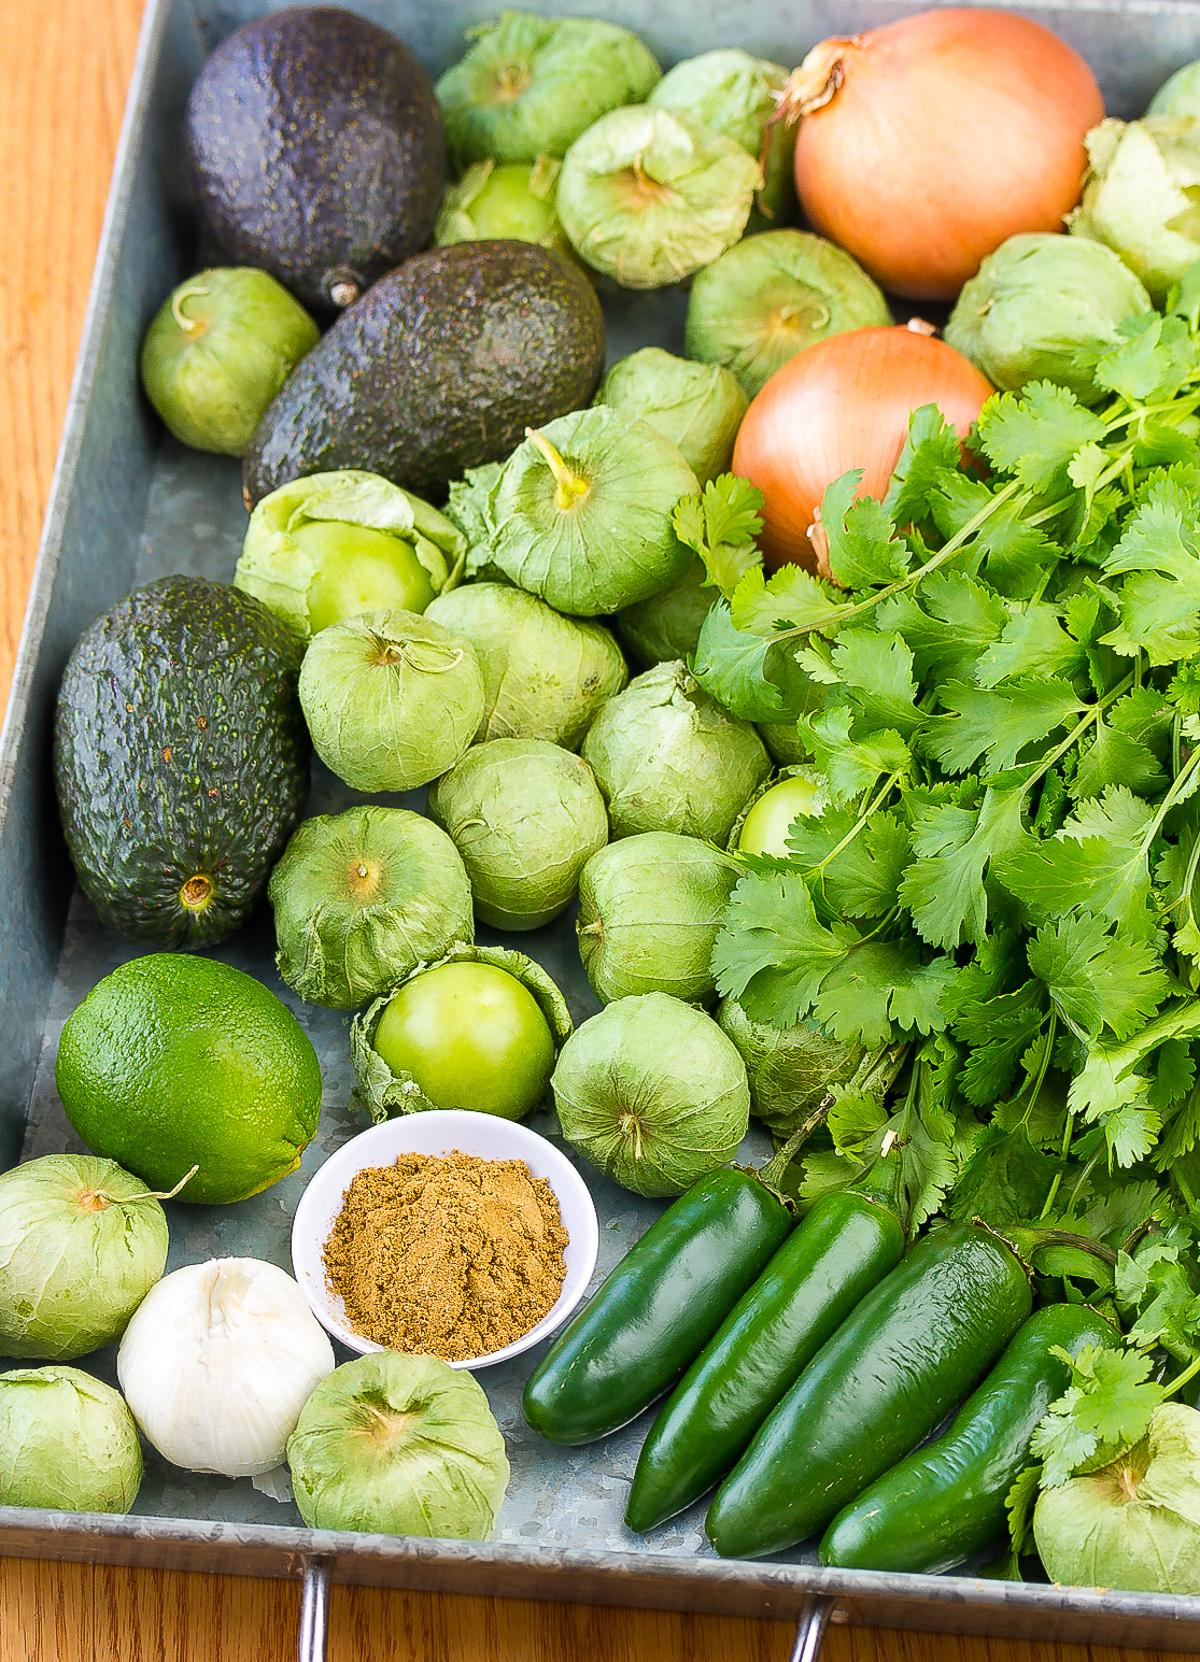 How To Make Salsa Verde  #ASpicyPerspective #homemade #salsa #salsaverde #verde #avocado #tomatillo #best #summer #fresh